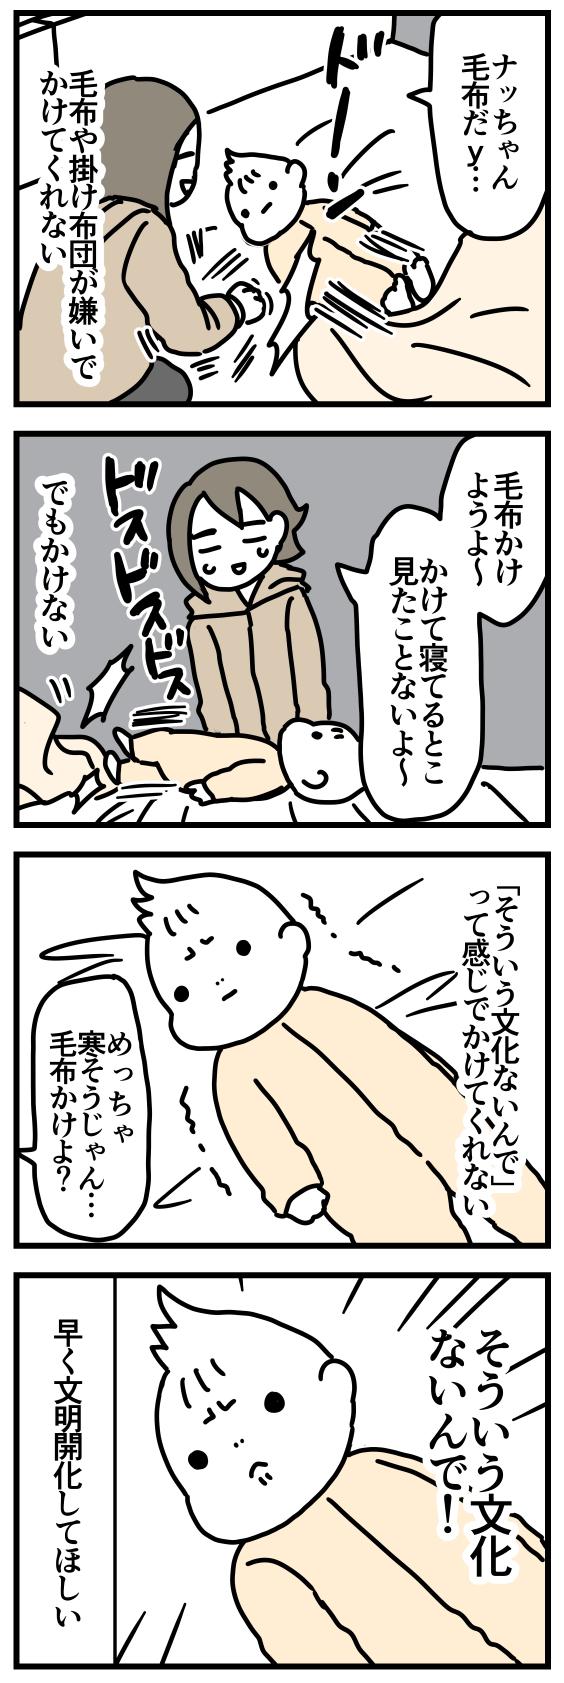 f:id:kanemotonomukuu:20170930173912j:plain